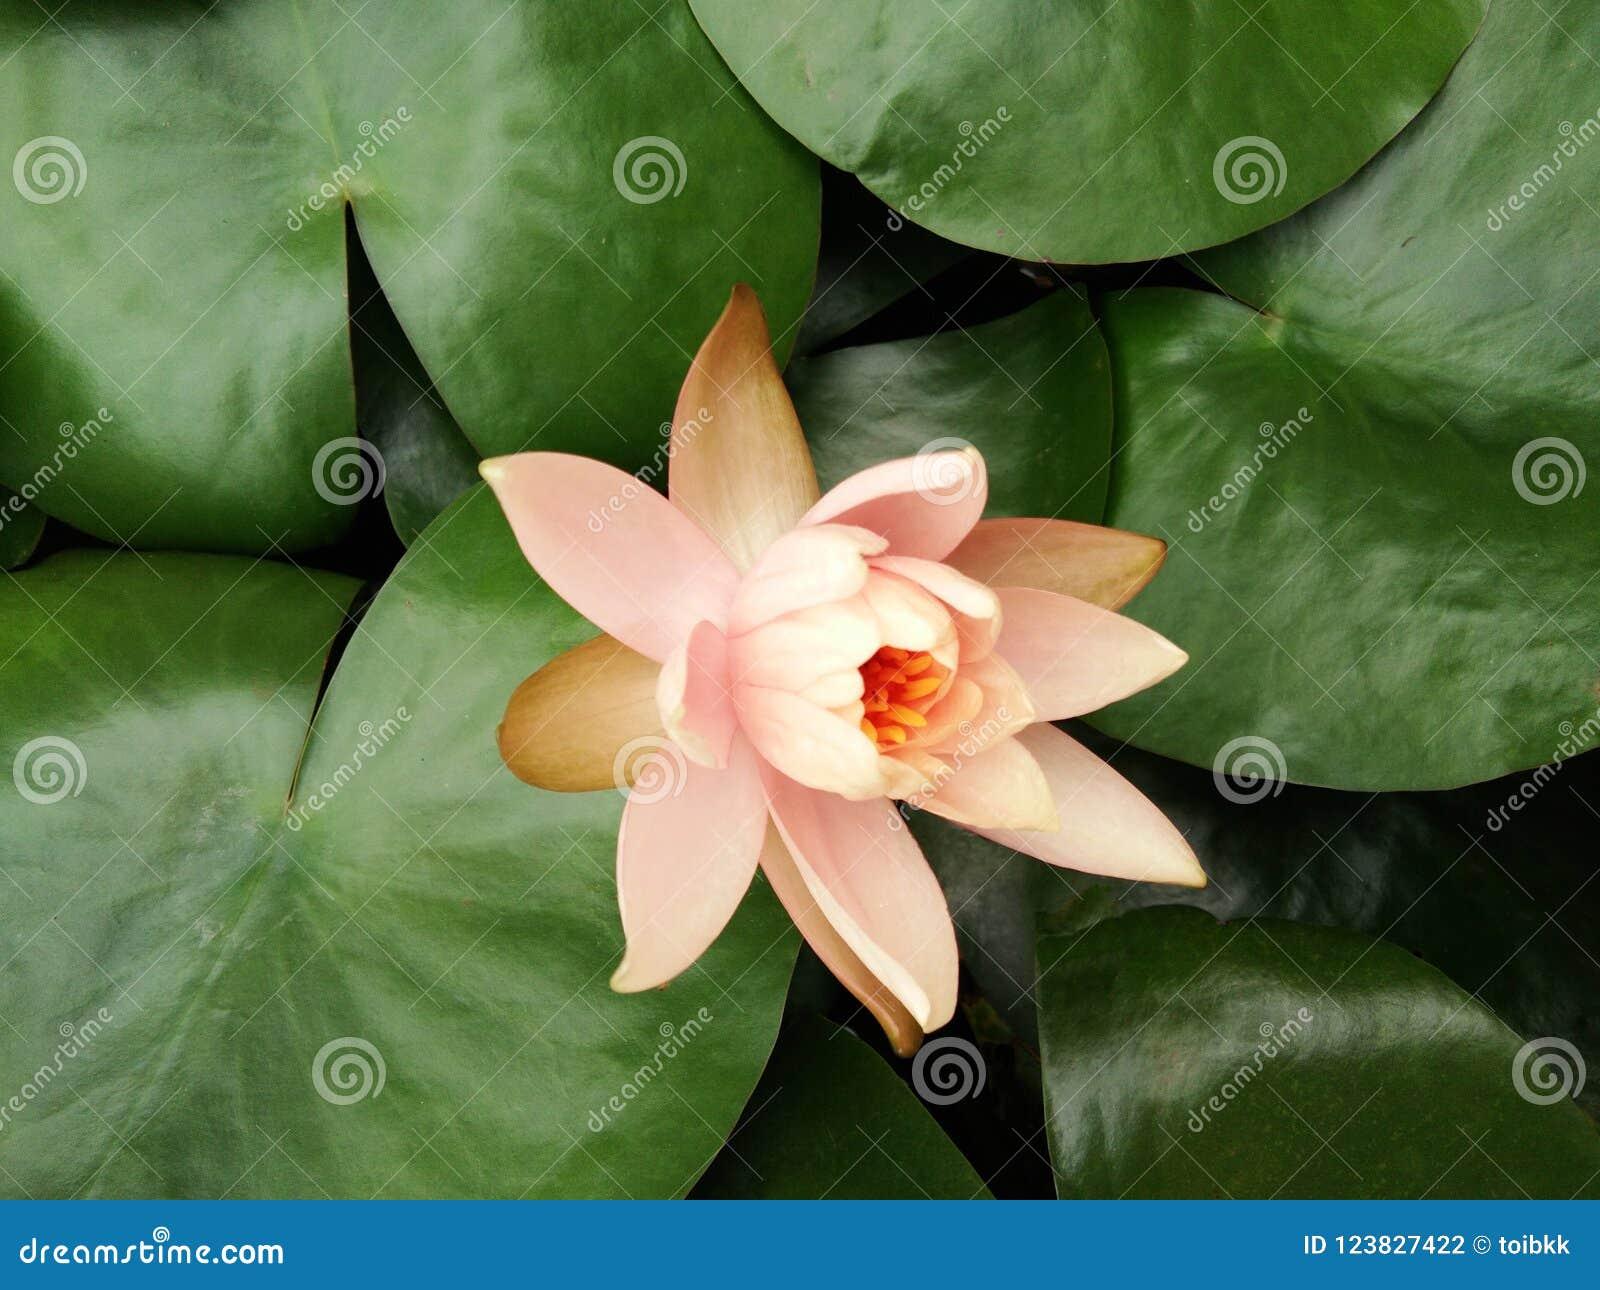 Orange lotus flower or water lily on green leaves background stock orange lotus flower or water lily on green leaves background izmirmasajfo